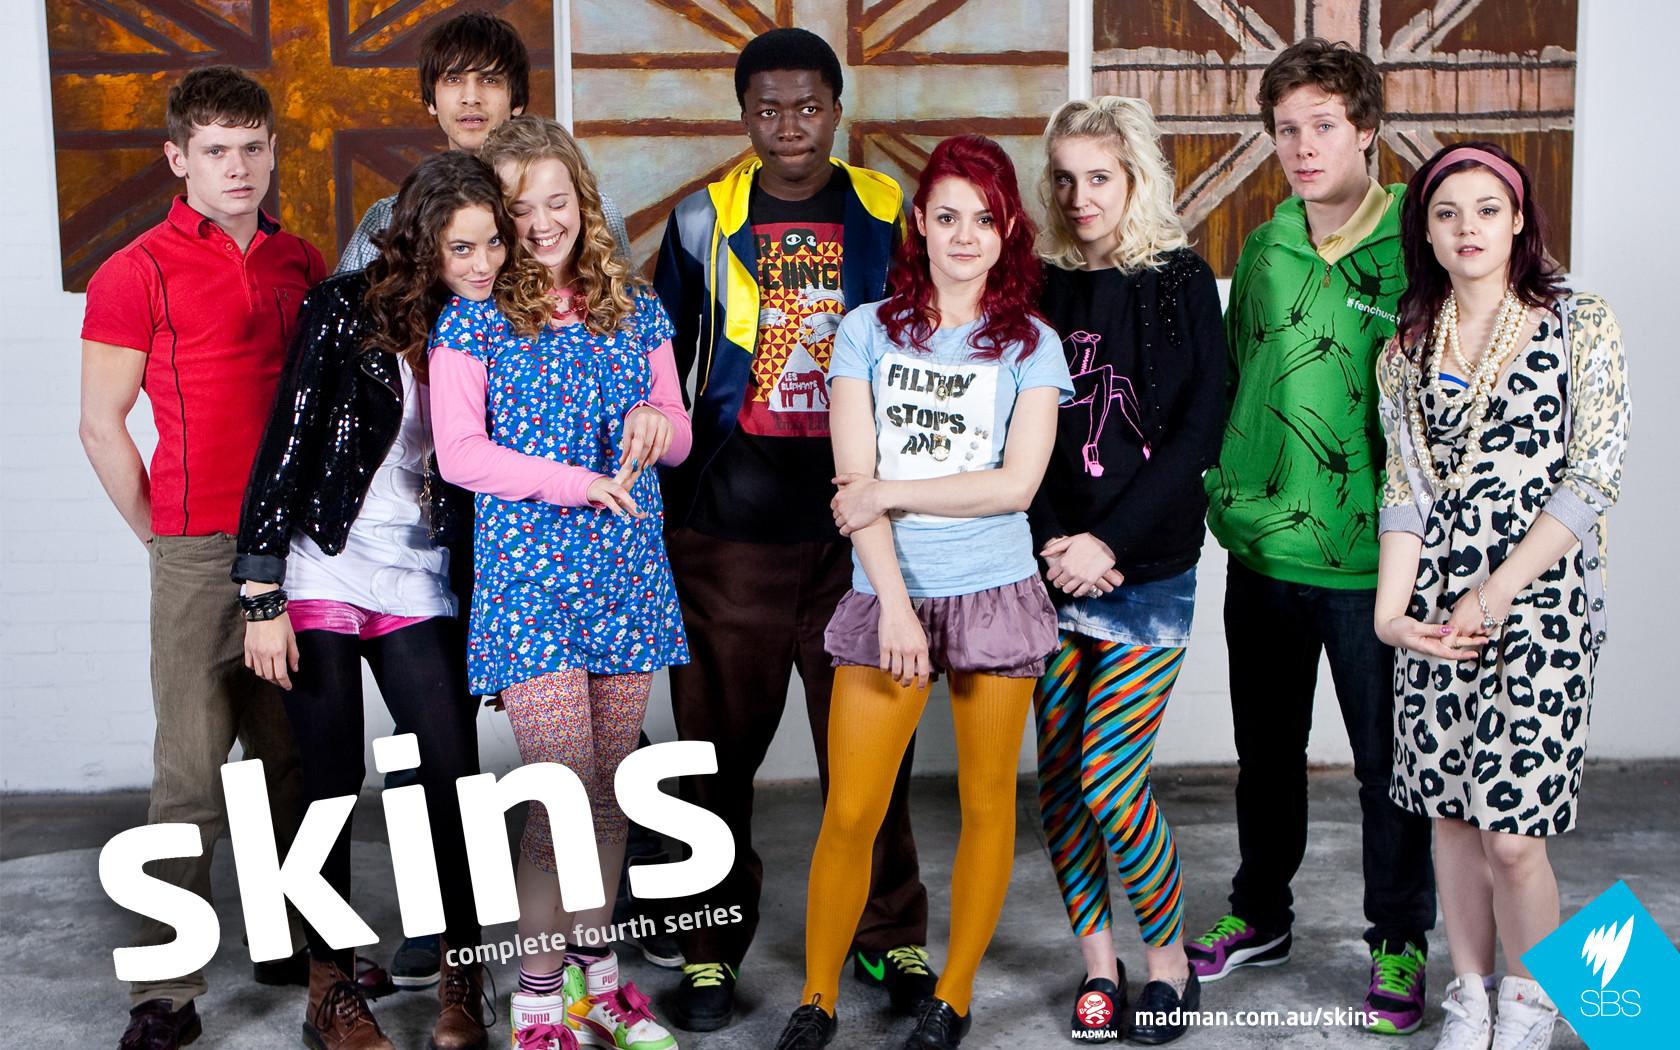 Skins (MTV)